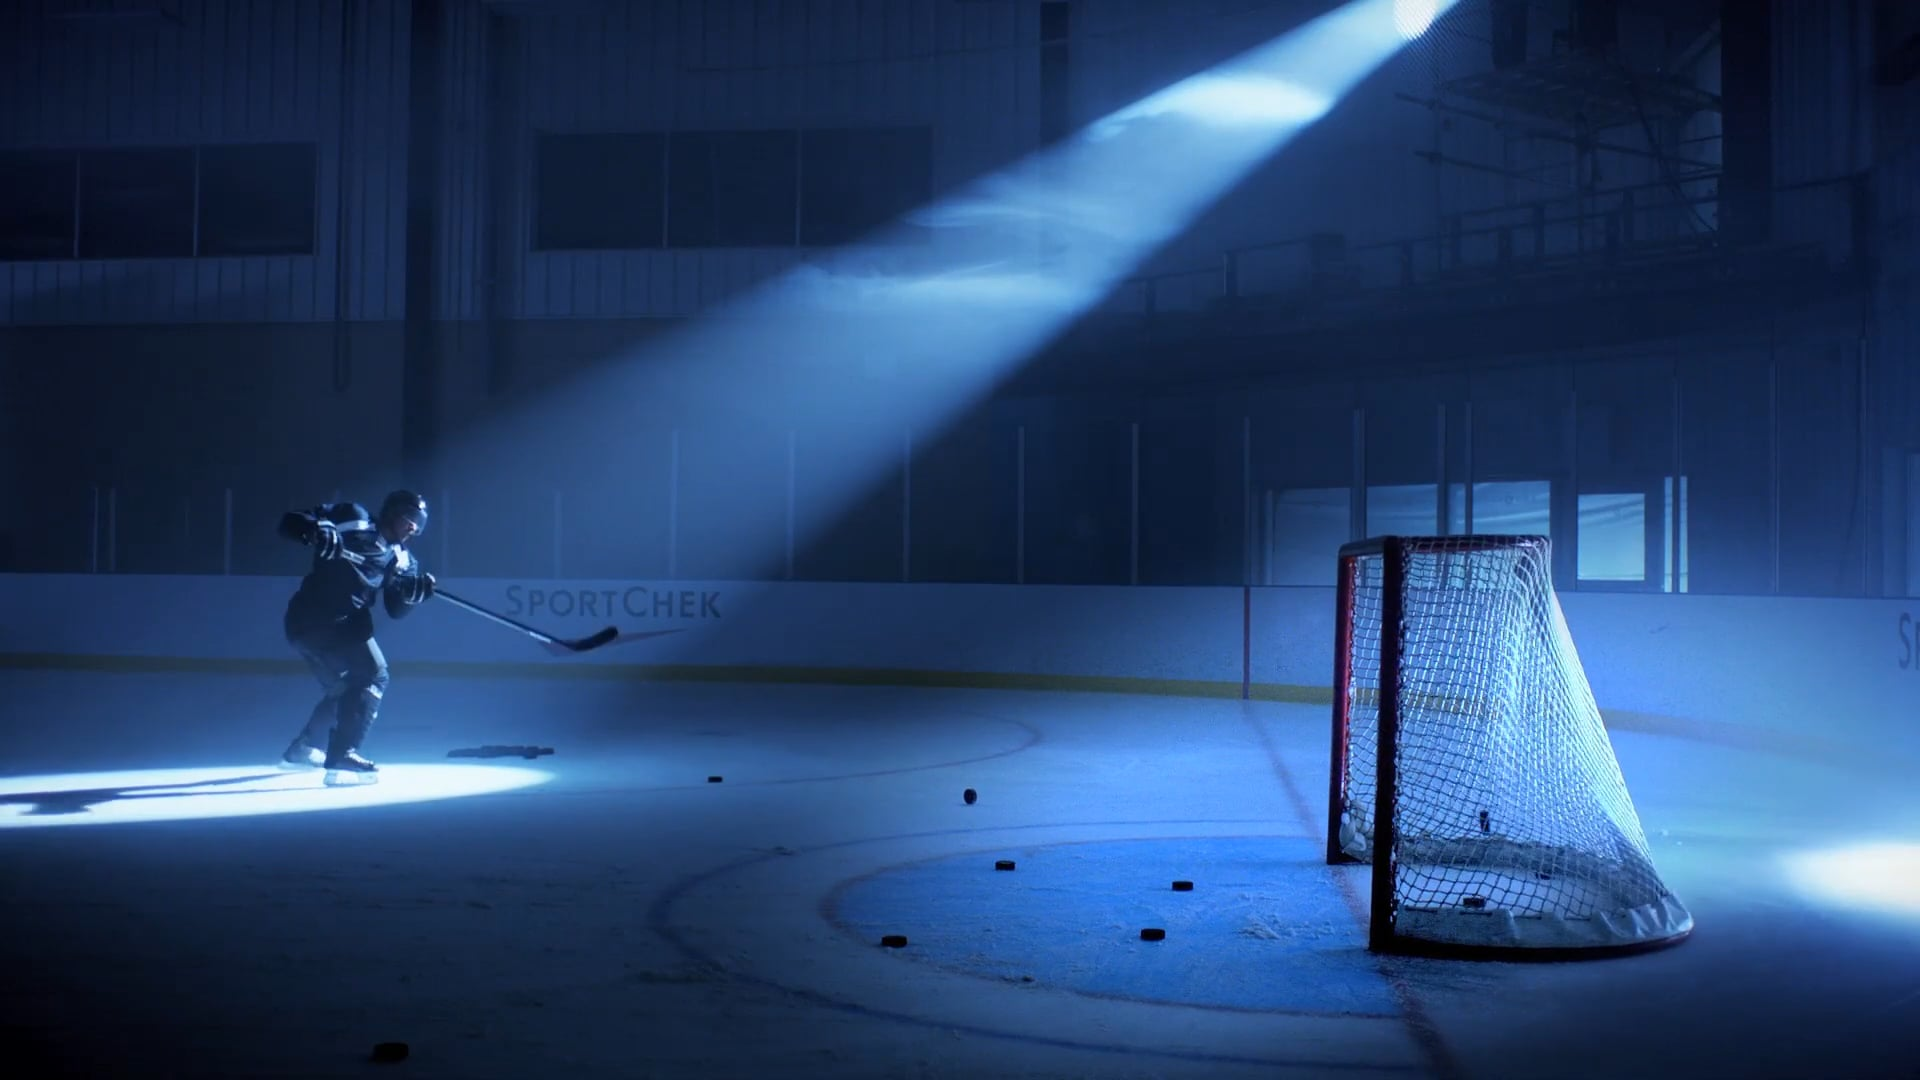 Sport Chek - Crosby - Ode To Hockey